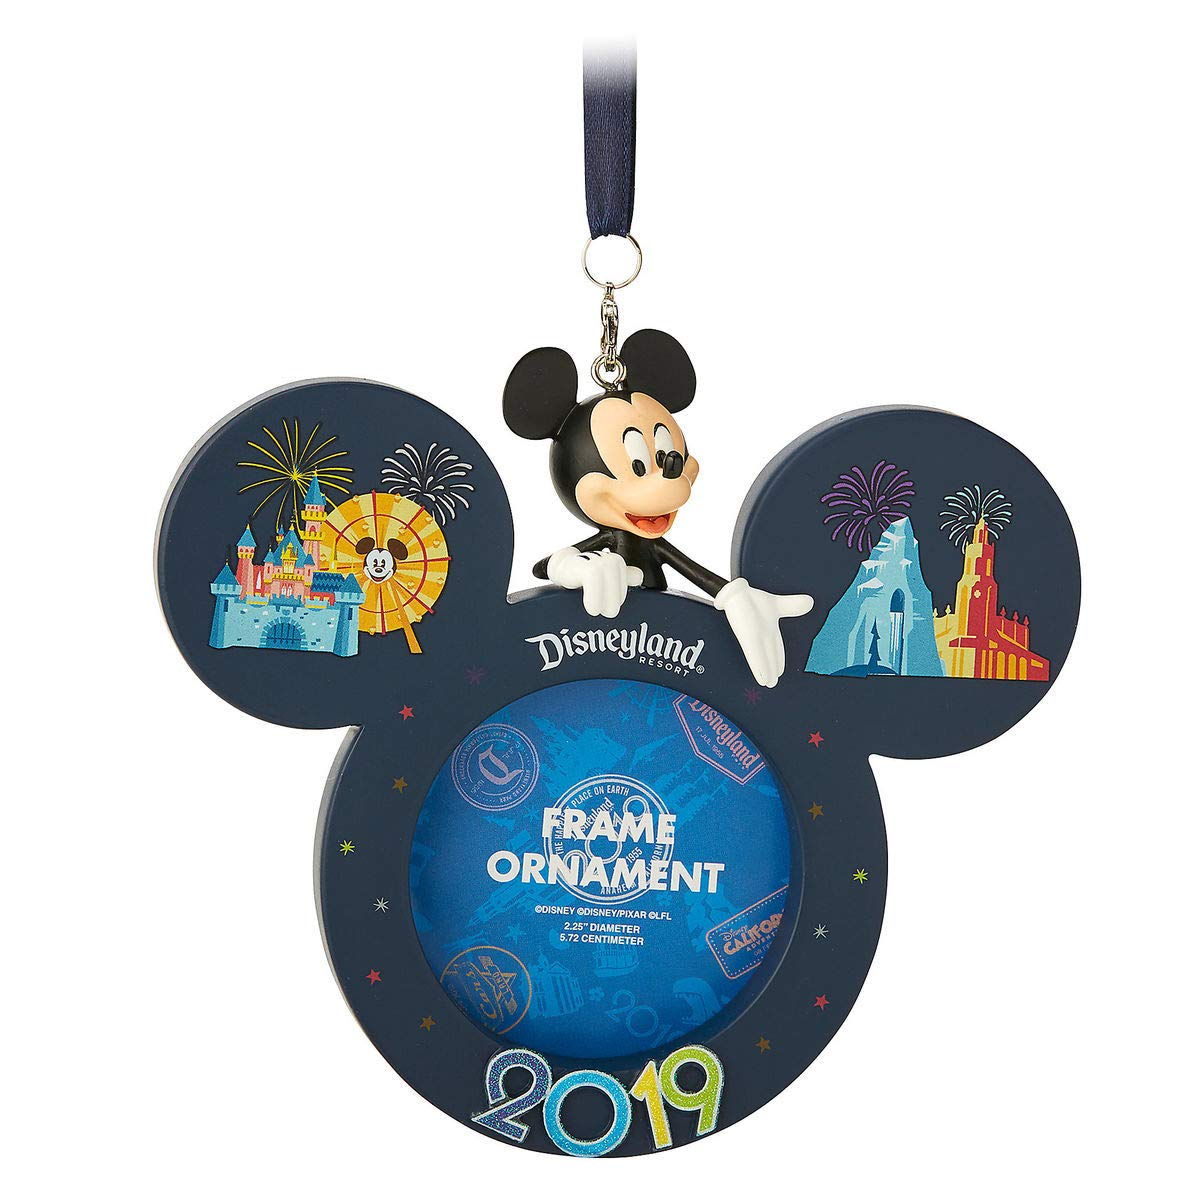 Theme Parks Disneyland Resort 2019 Mickey Mouse Frame Ornament